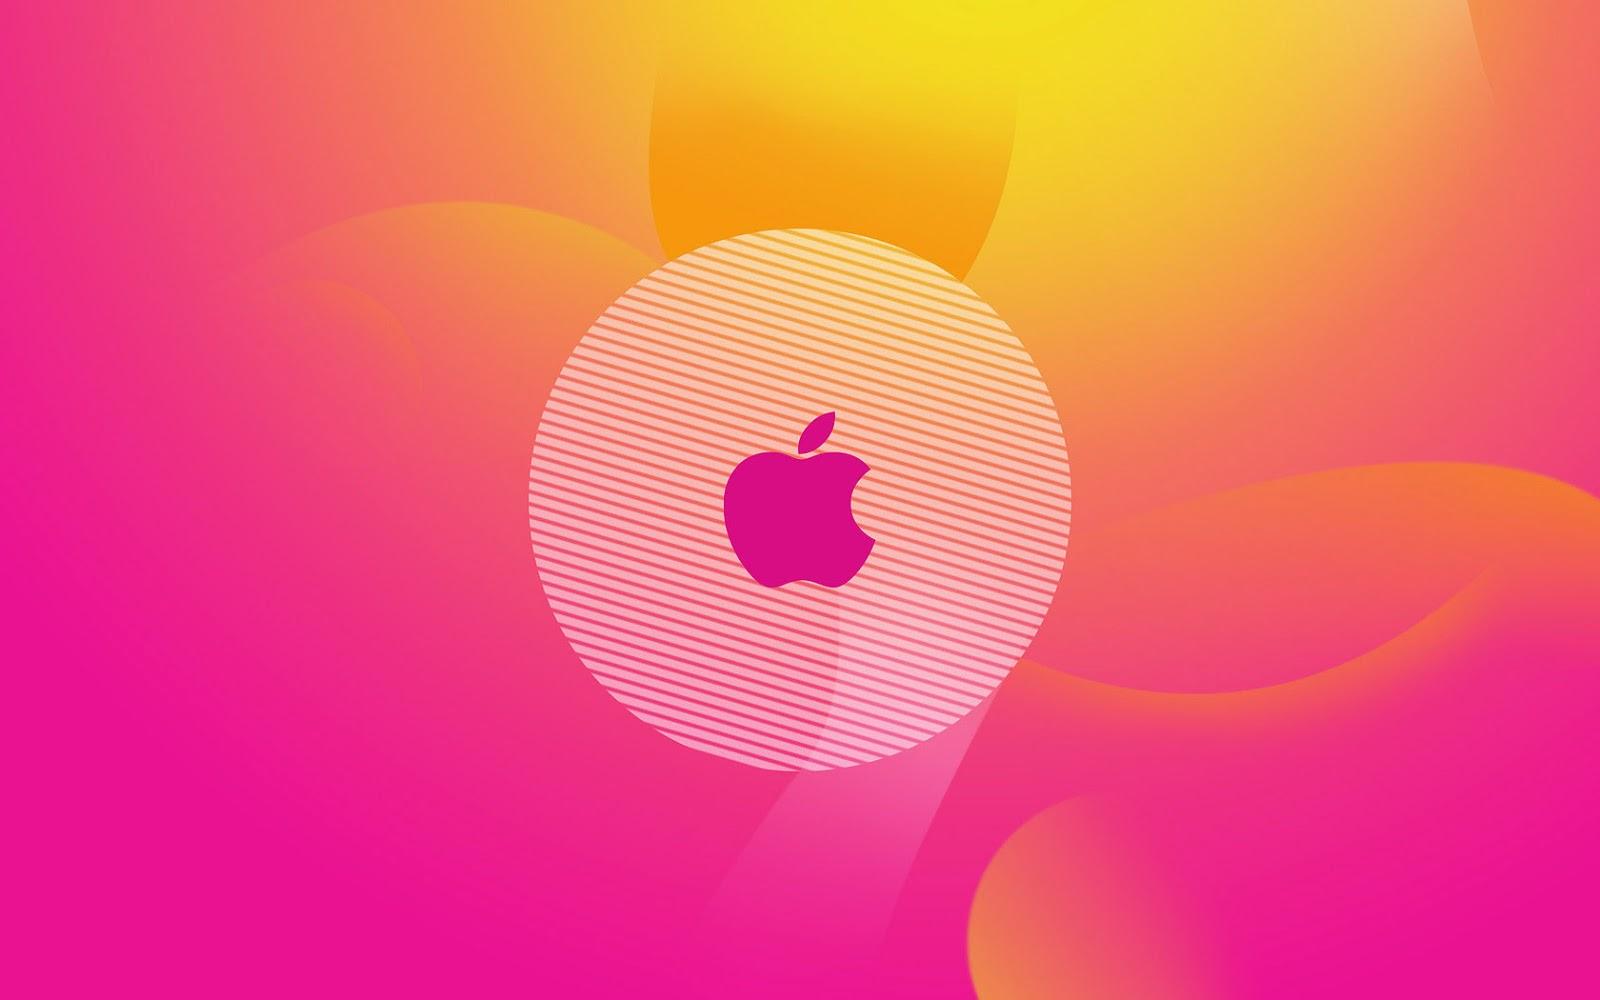 http://3.bp.blogspot.com/-9lQEmJUCBV8/UNG5wjMFarI/AAAAAAAAJDE/A5pV9fWJrG4/s1600/oranje-roze-apple-achtergrond-met-apple-logo-in-het-midden.jpg